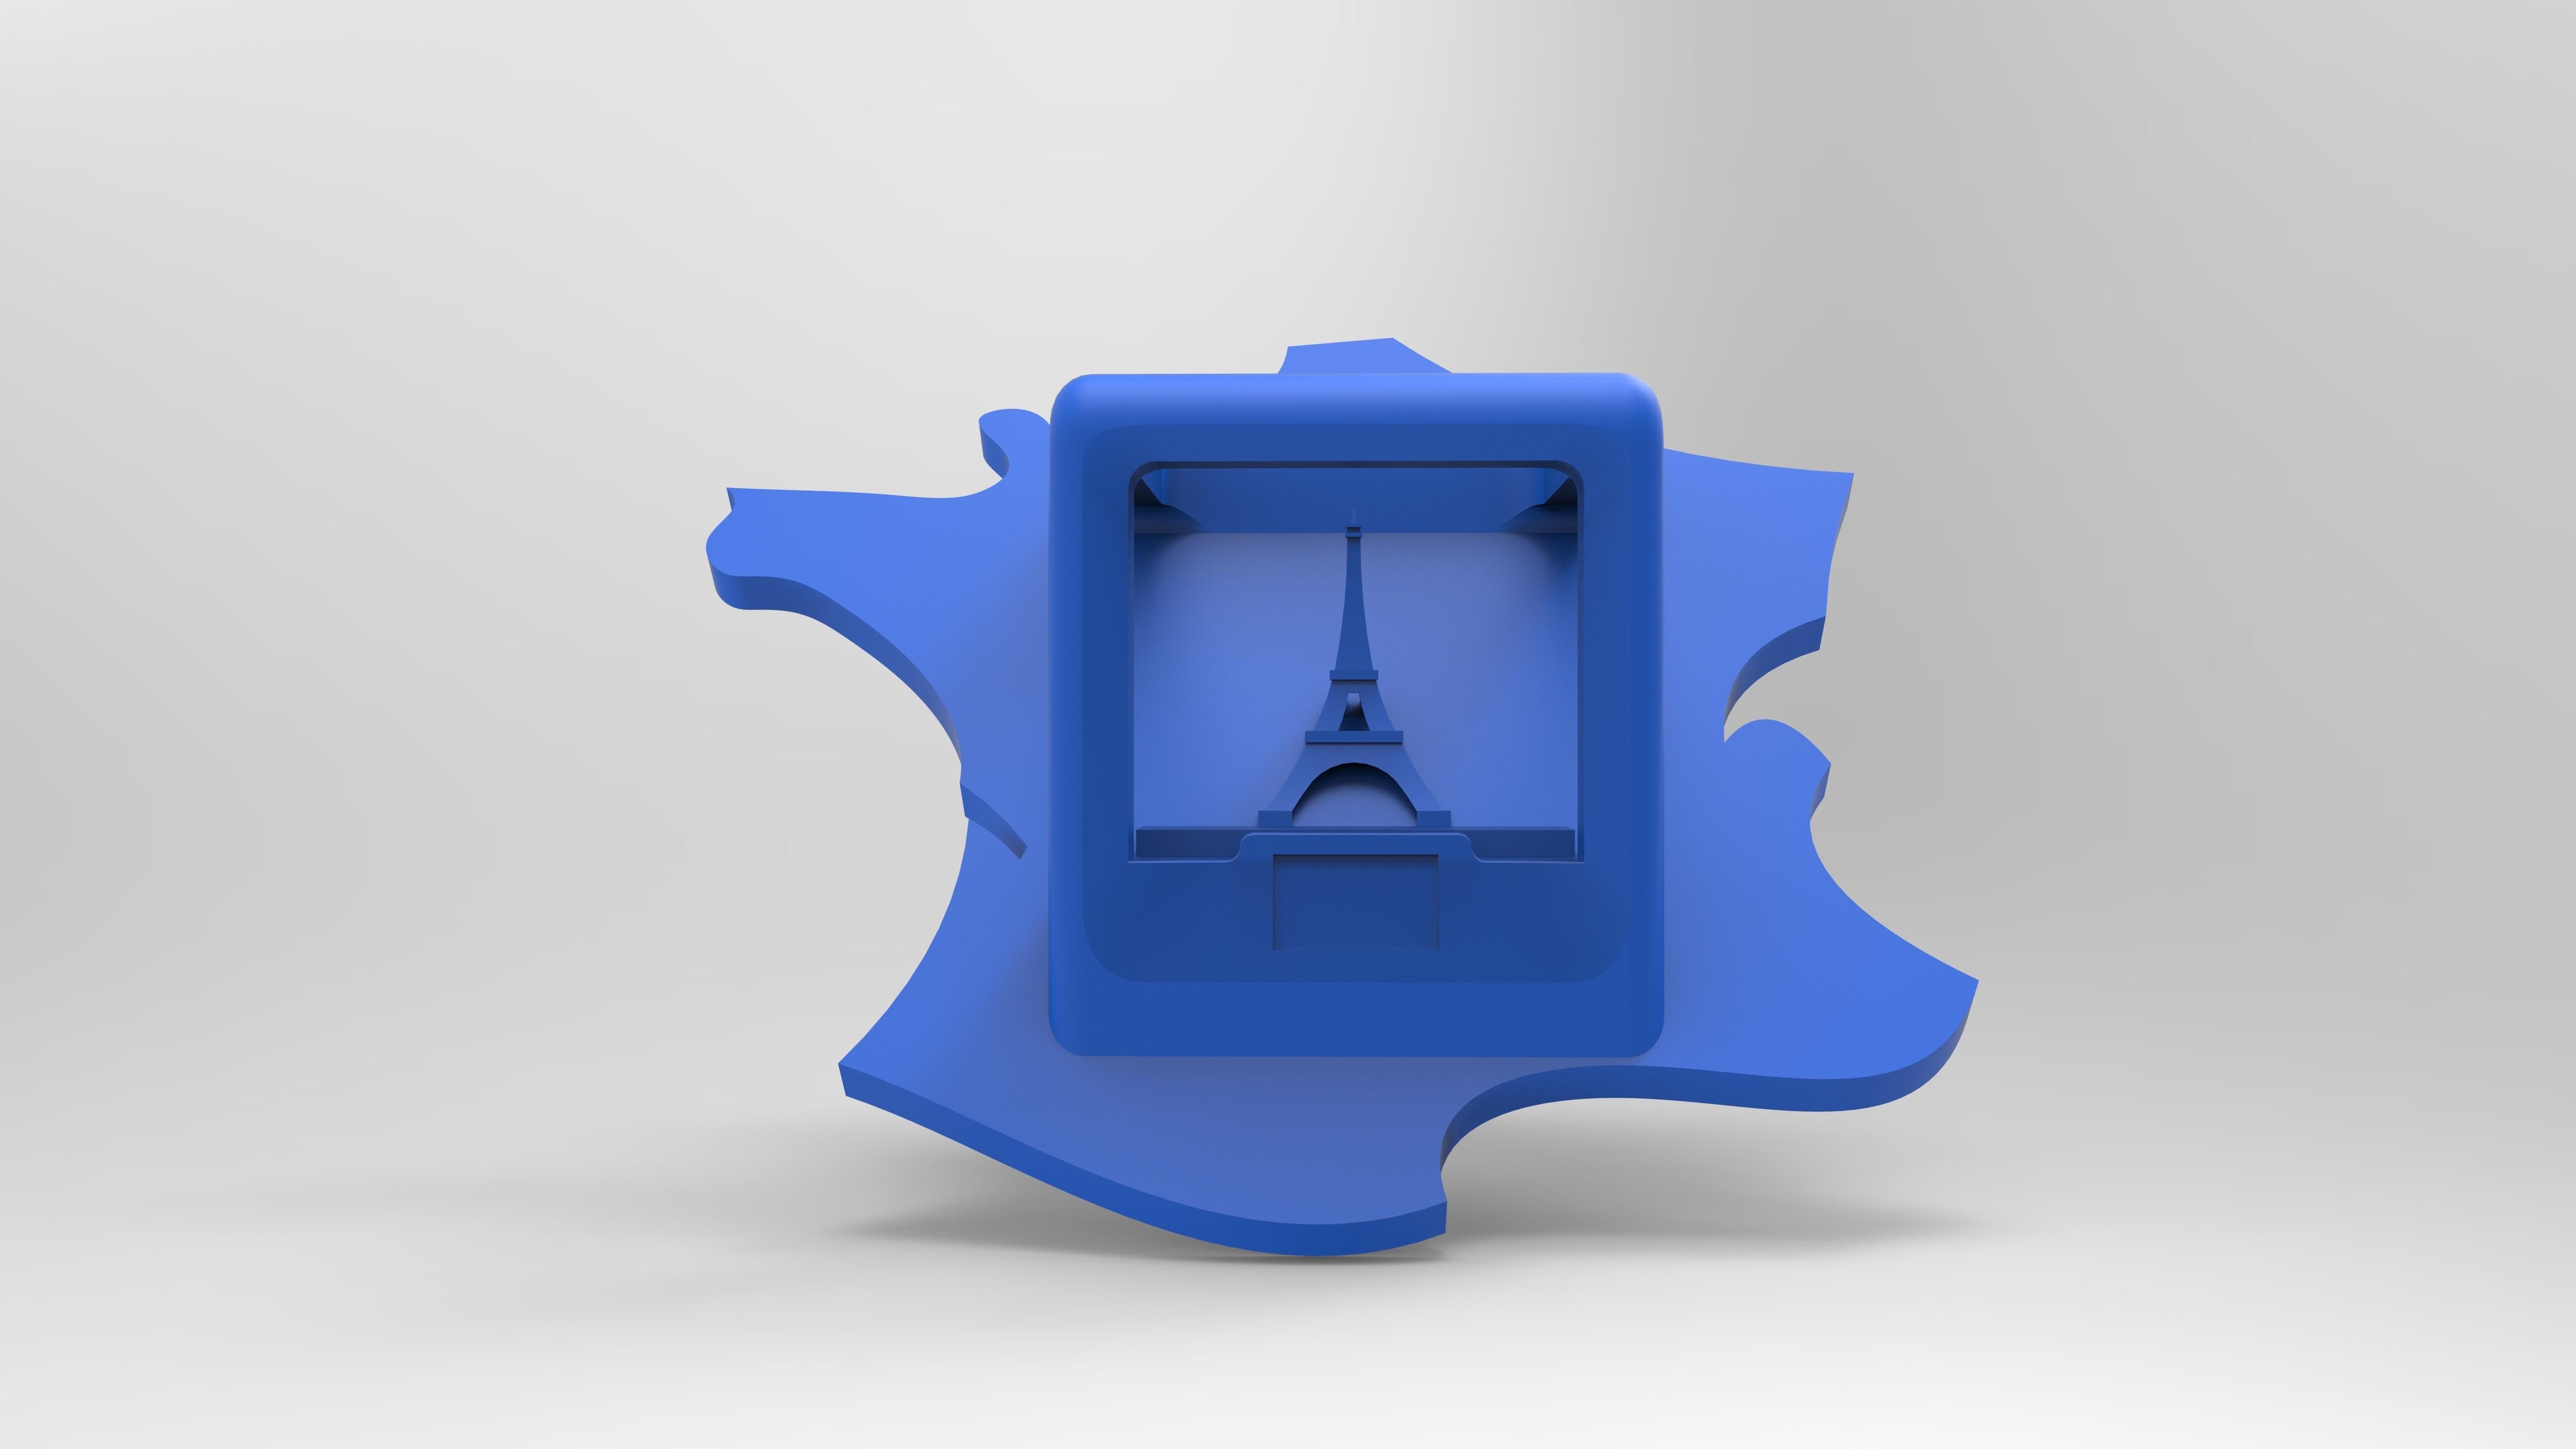 rendufacebleu.196.jpg Download free STL file Key ring or stratomaker figurine - printer located in France • 3D printer template, GuilhemPerroud